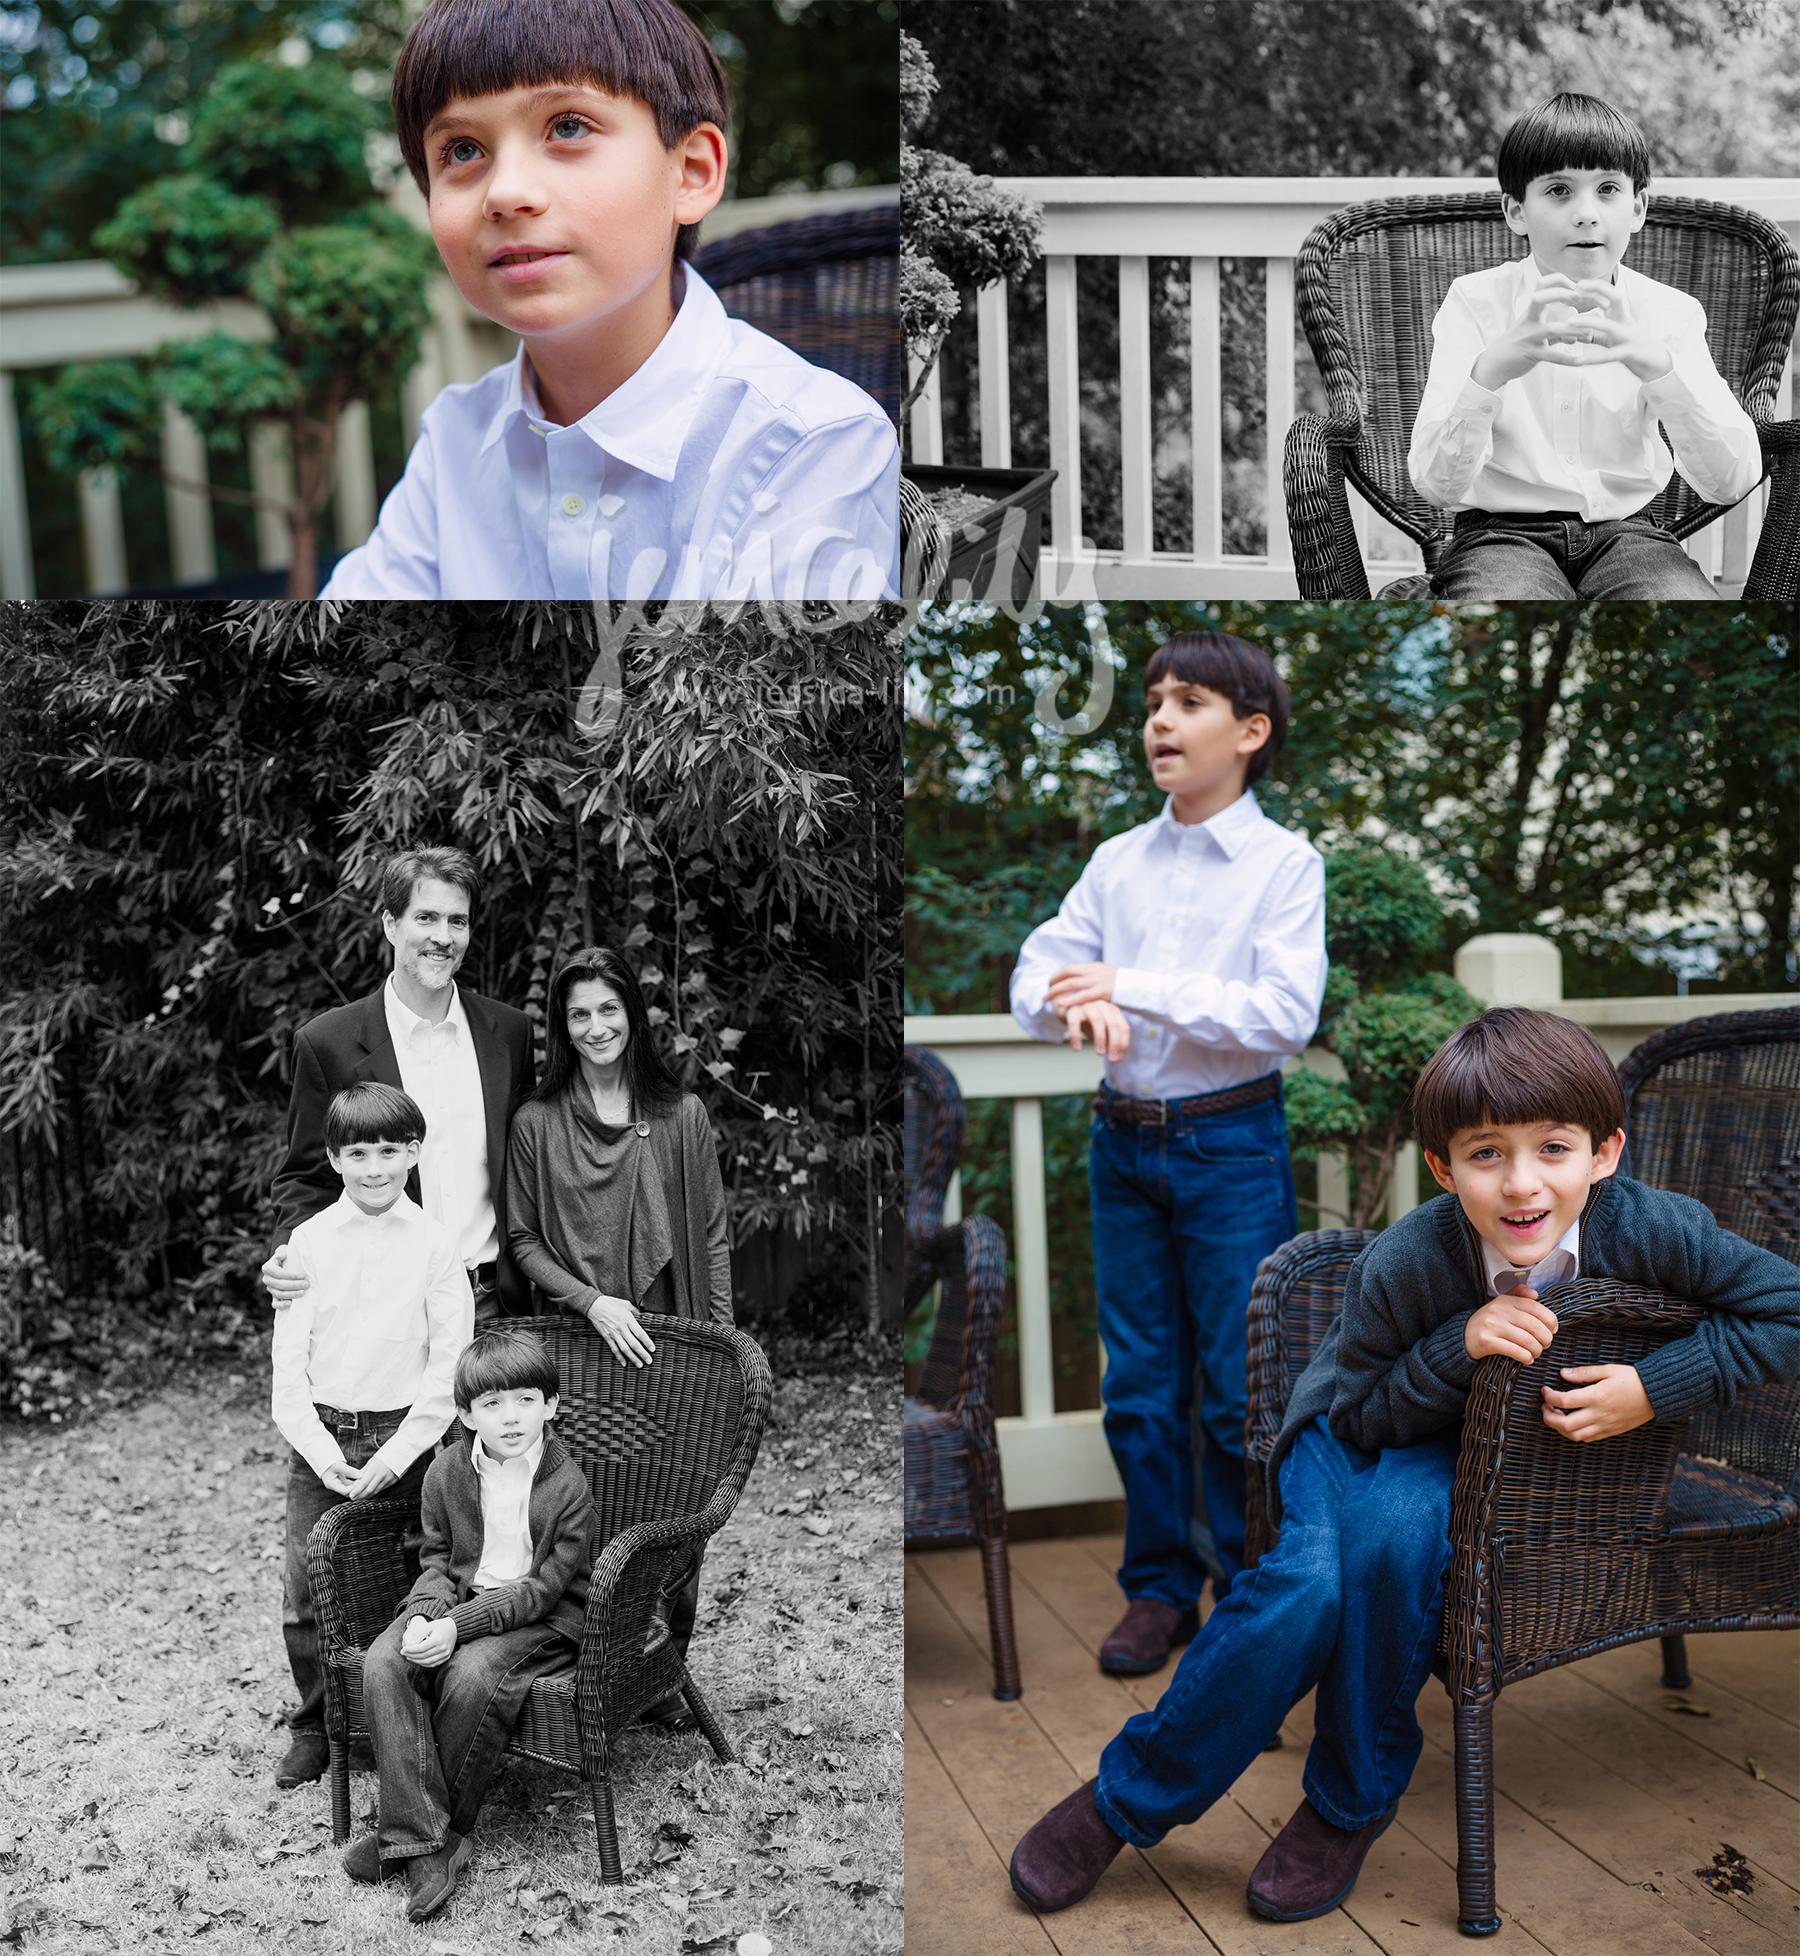 Pate Family Portrait Photographer